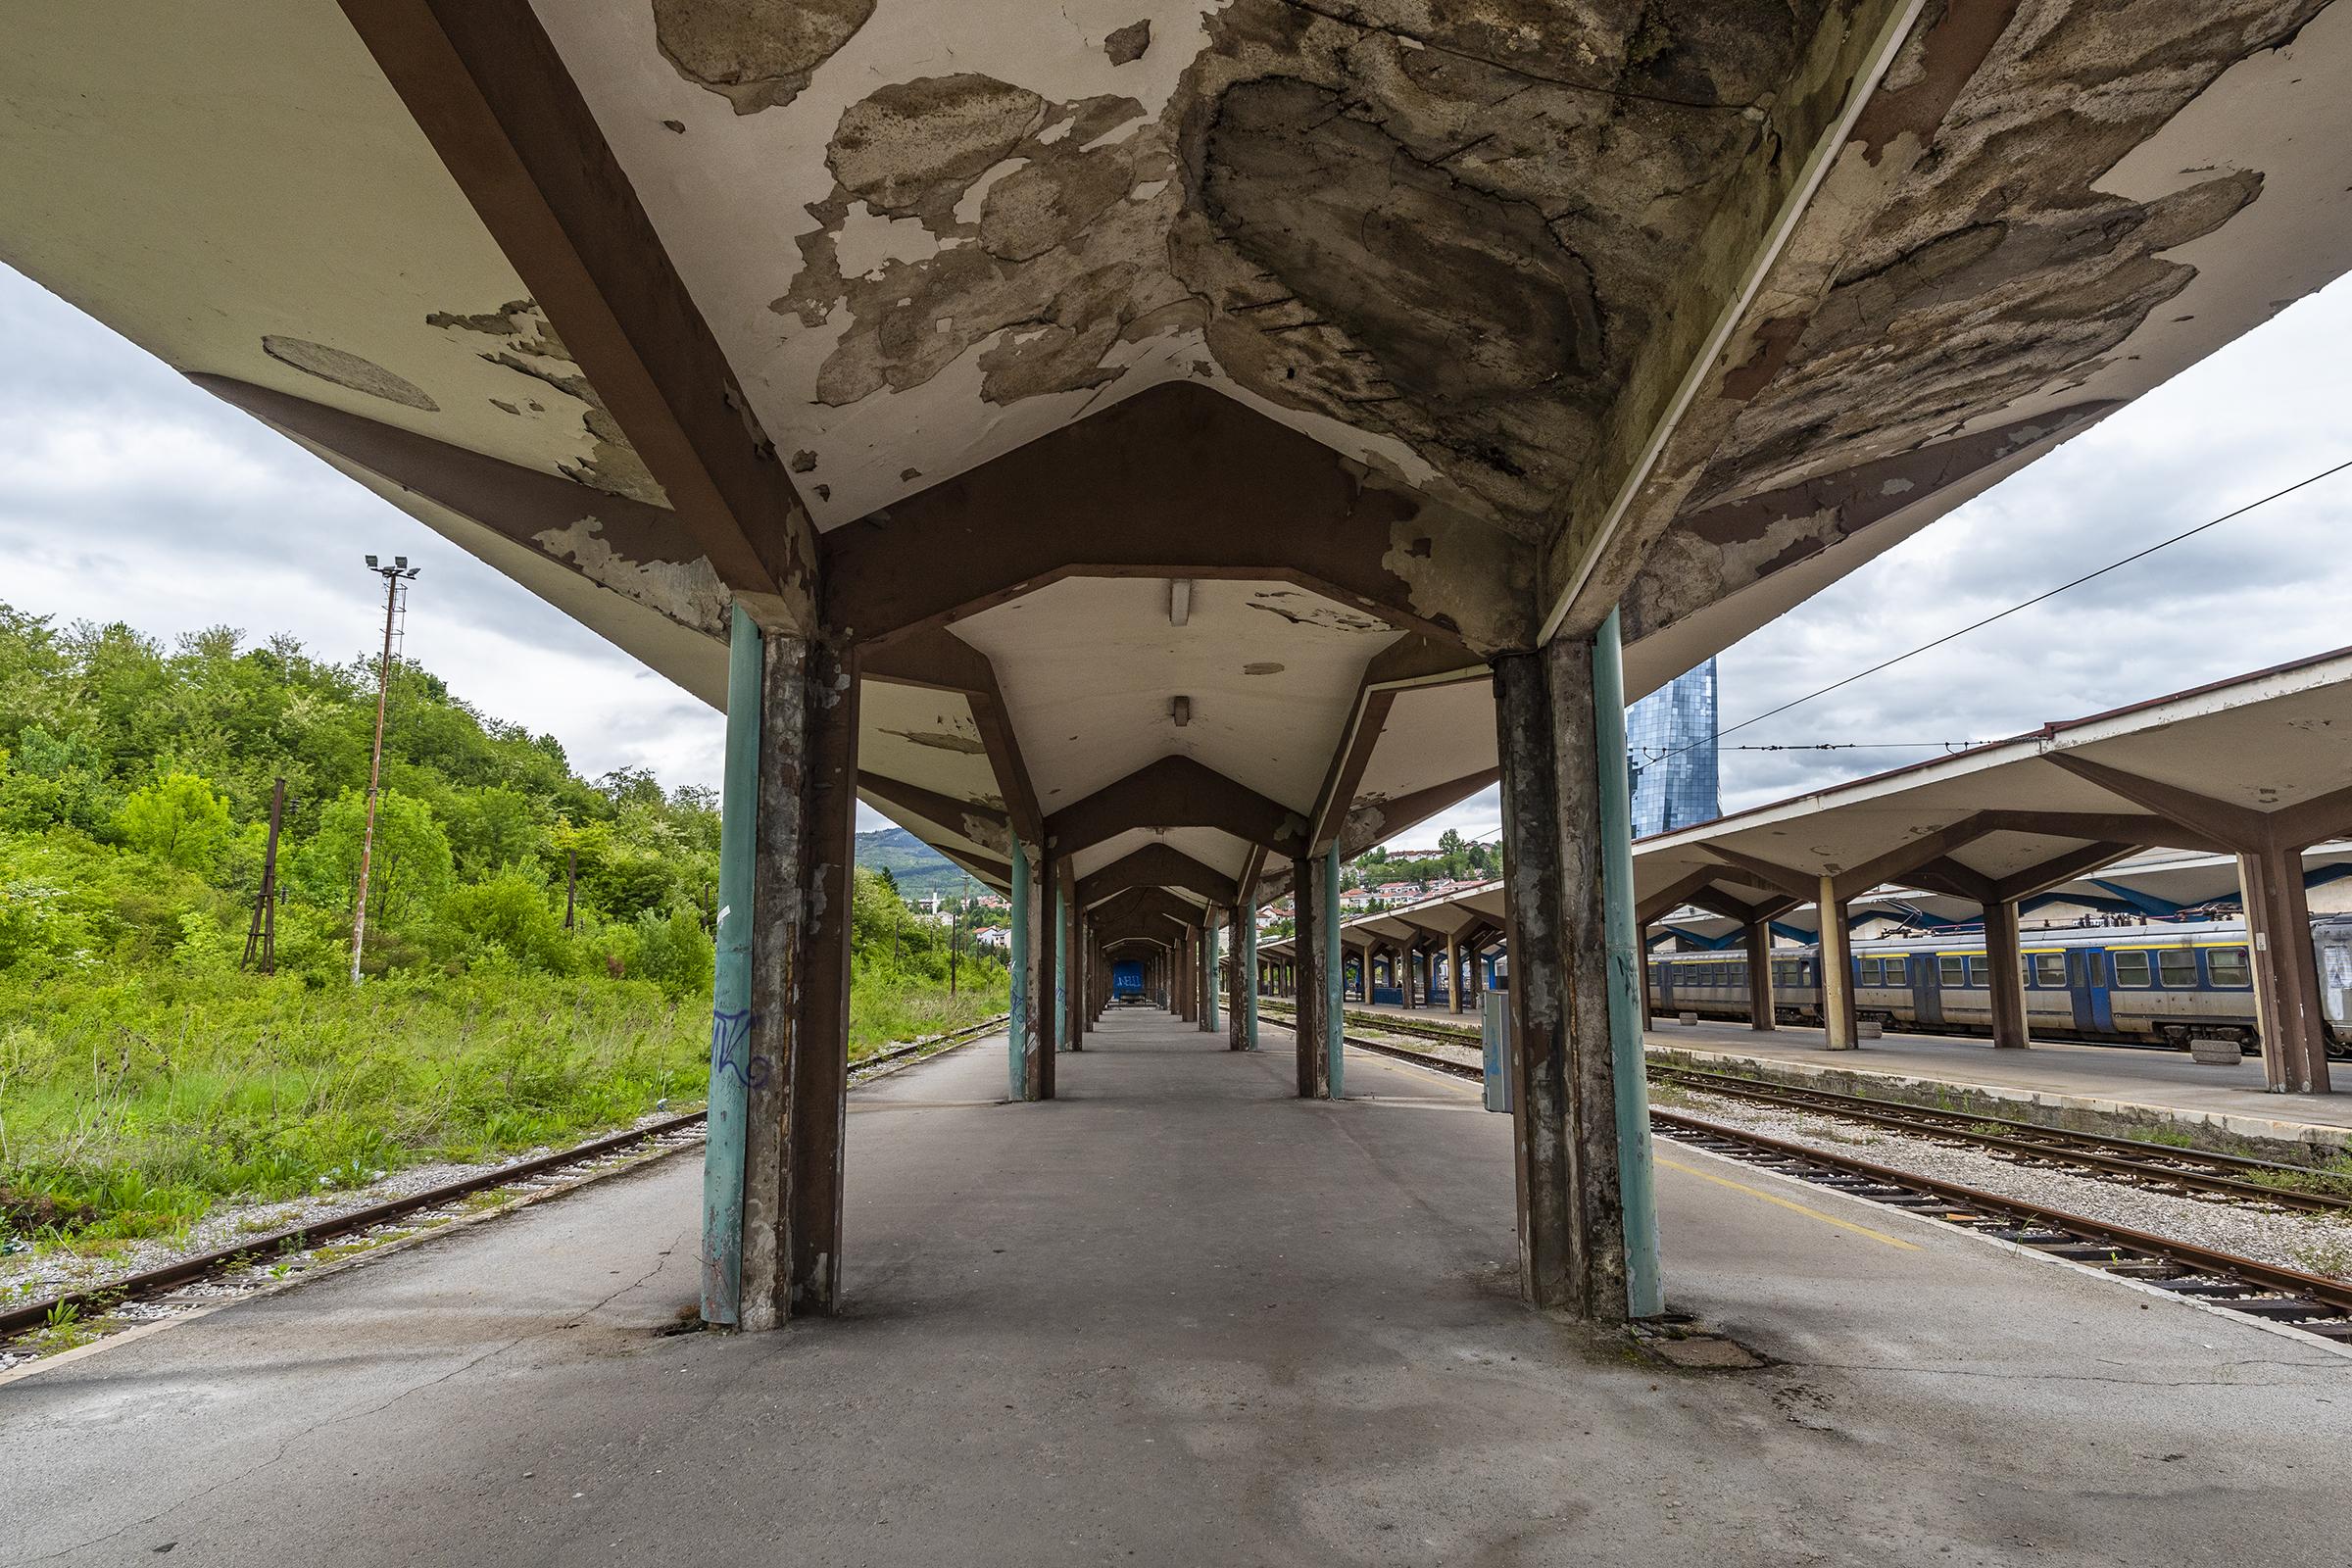 Denis McCready, Sarajevo Traces 06, 2019